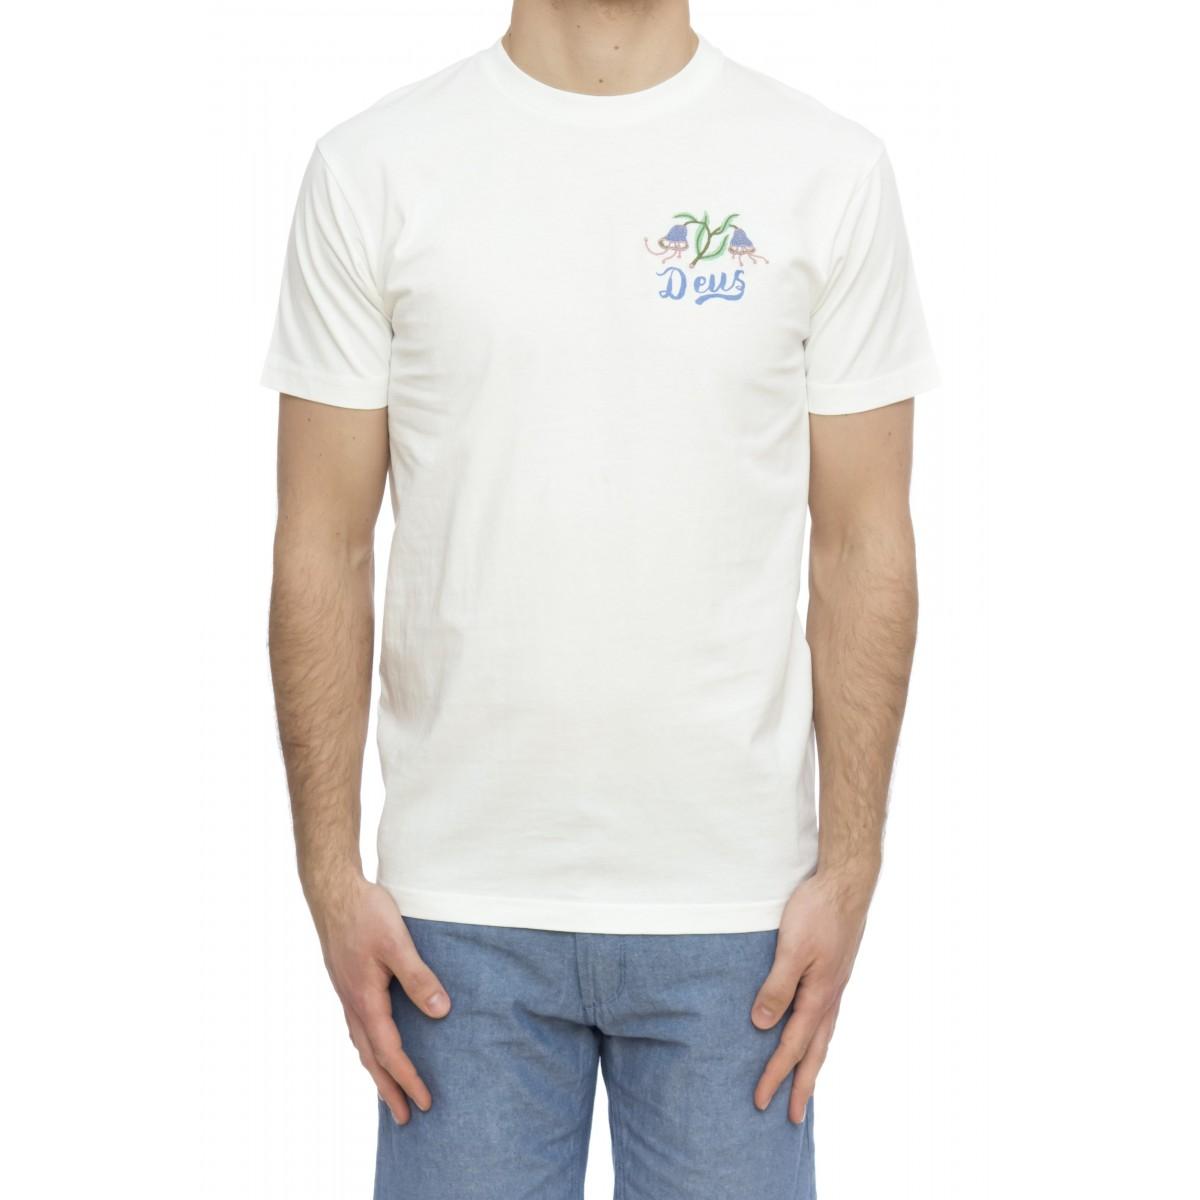 T-shirt - Tee140 t-shirt ricamo